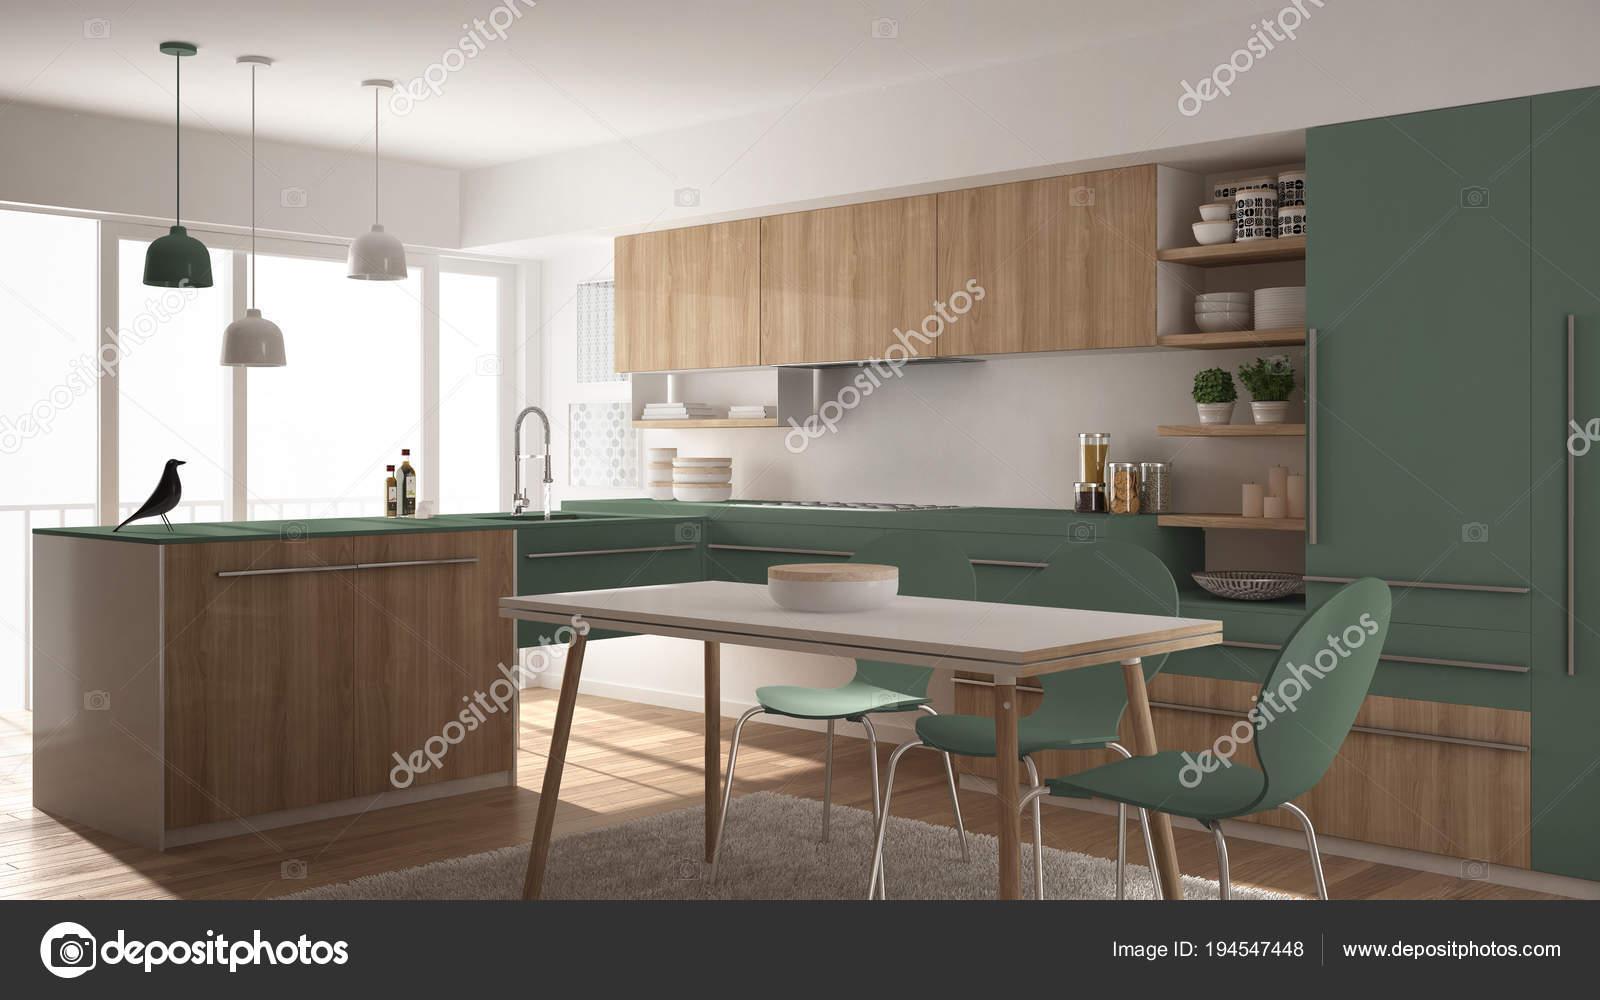 modern kitchen rugs island and stools 现代简约木制厨房配有餐桌 地毯 全景窗 白绿色建筑室内设计 图库照片 白绿色